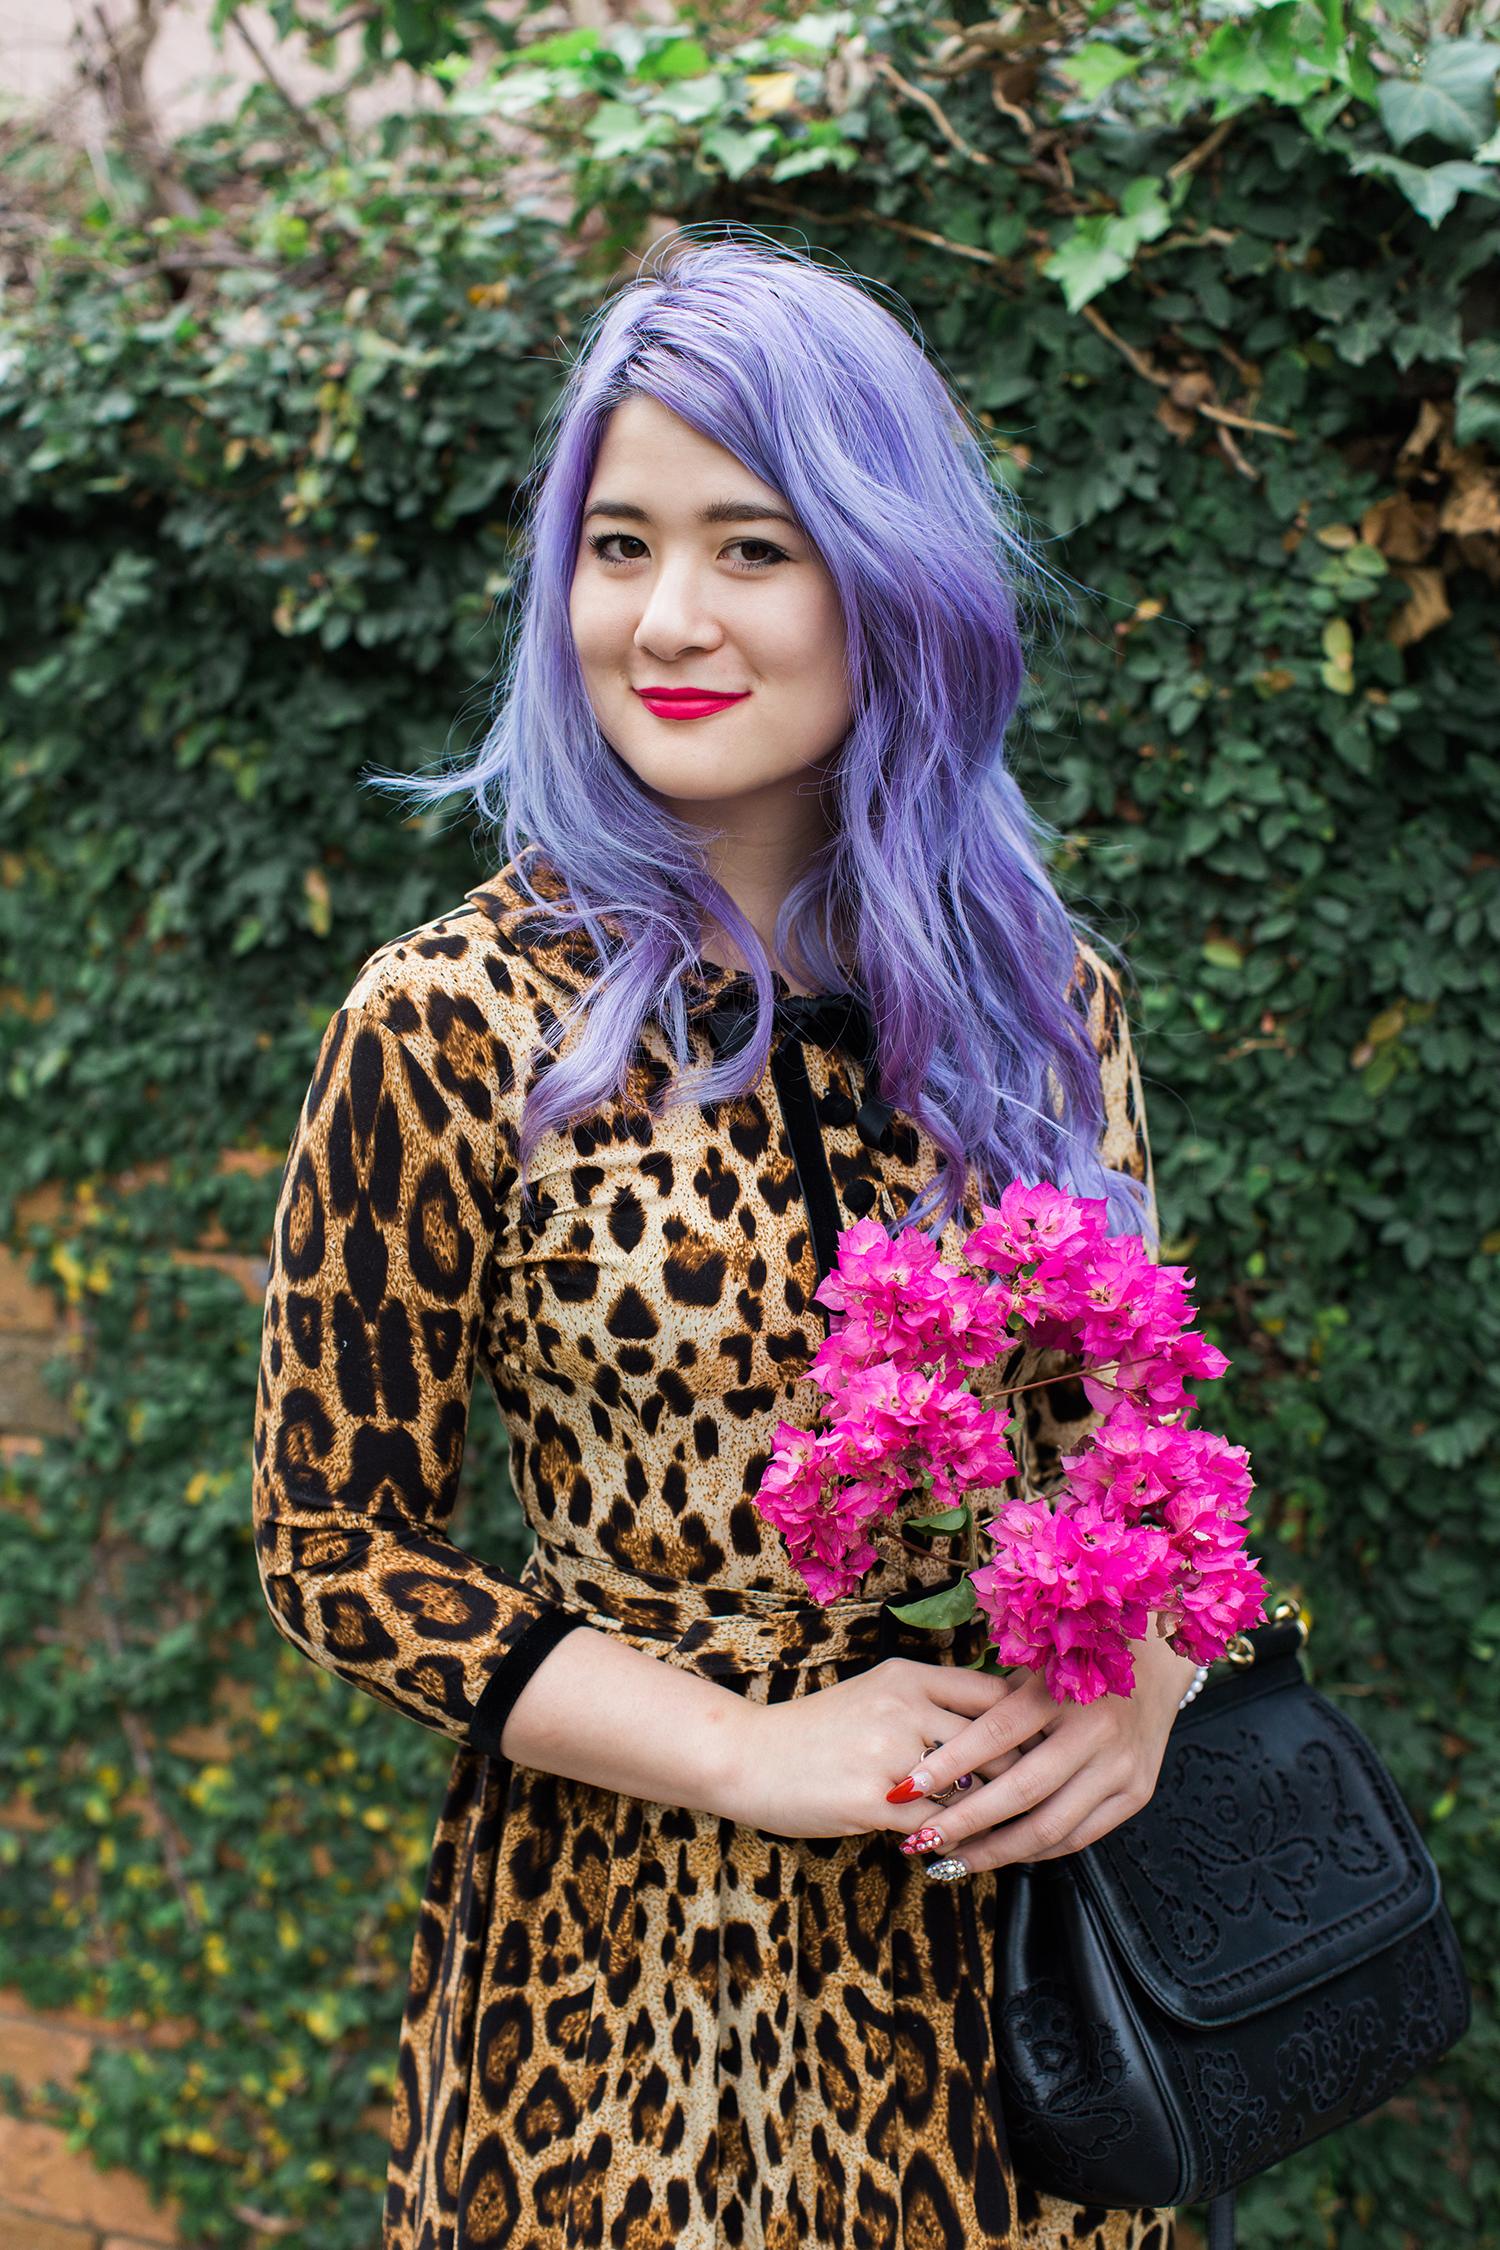 wheels and dollbaby leopard dress emi unicorn